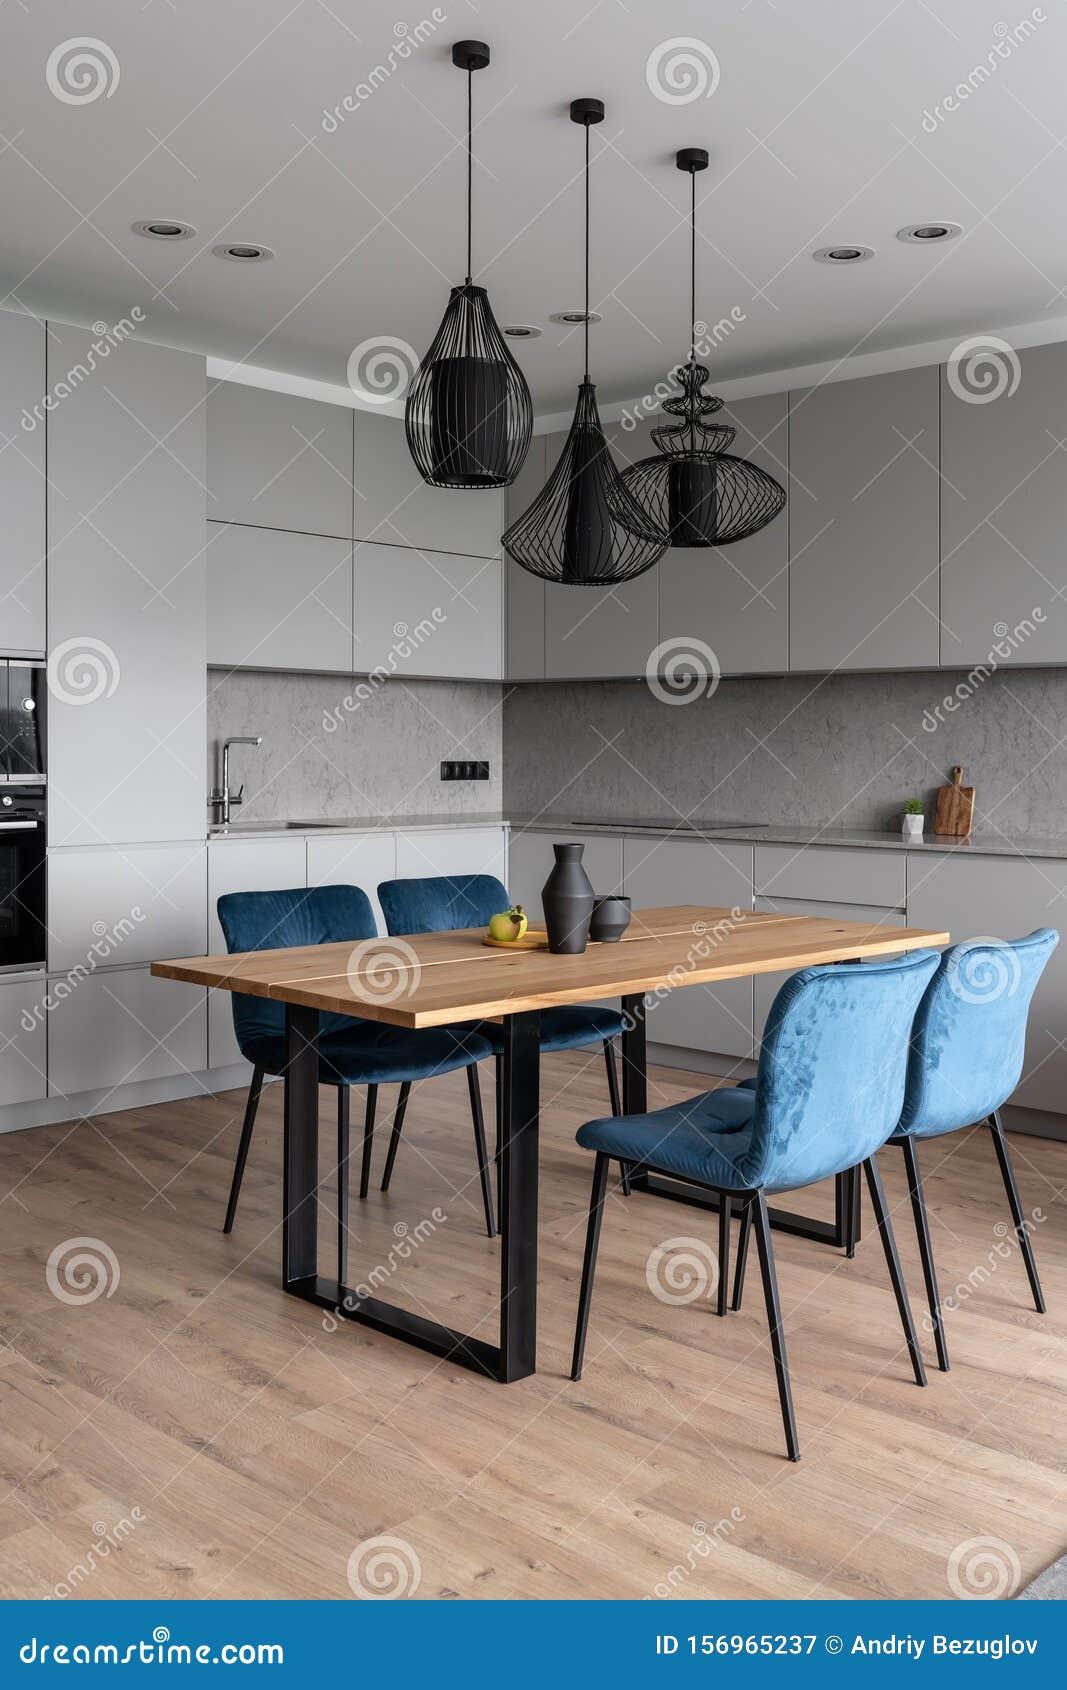 Stylish Modern Interior With Gray Kitchen Zone Stock Image Image Of Apple Decor 156965237